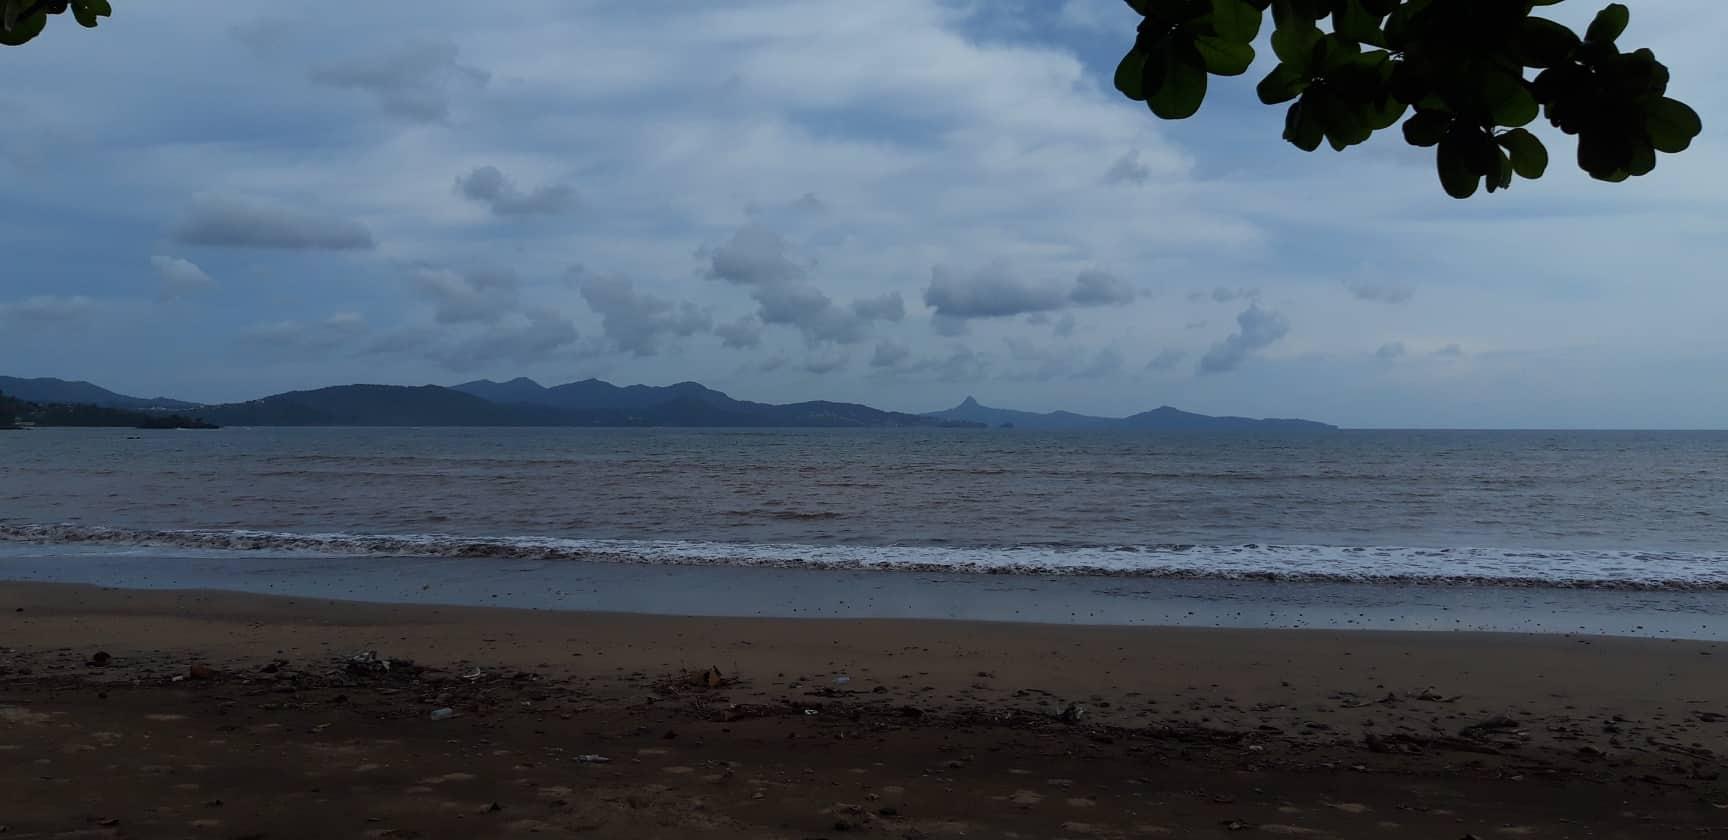 Cyclone tropical Belna à Mayotte, 7 déc 2019